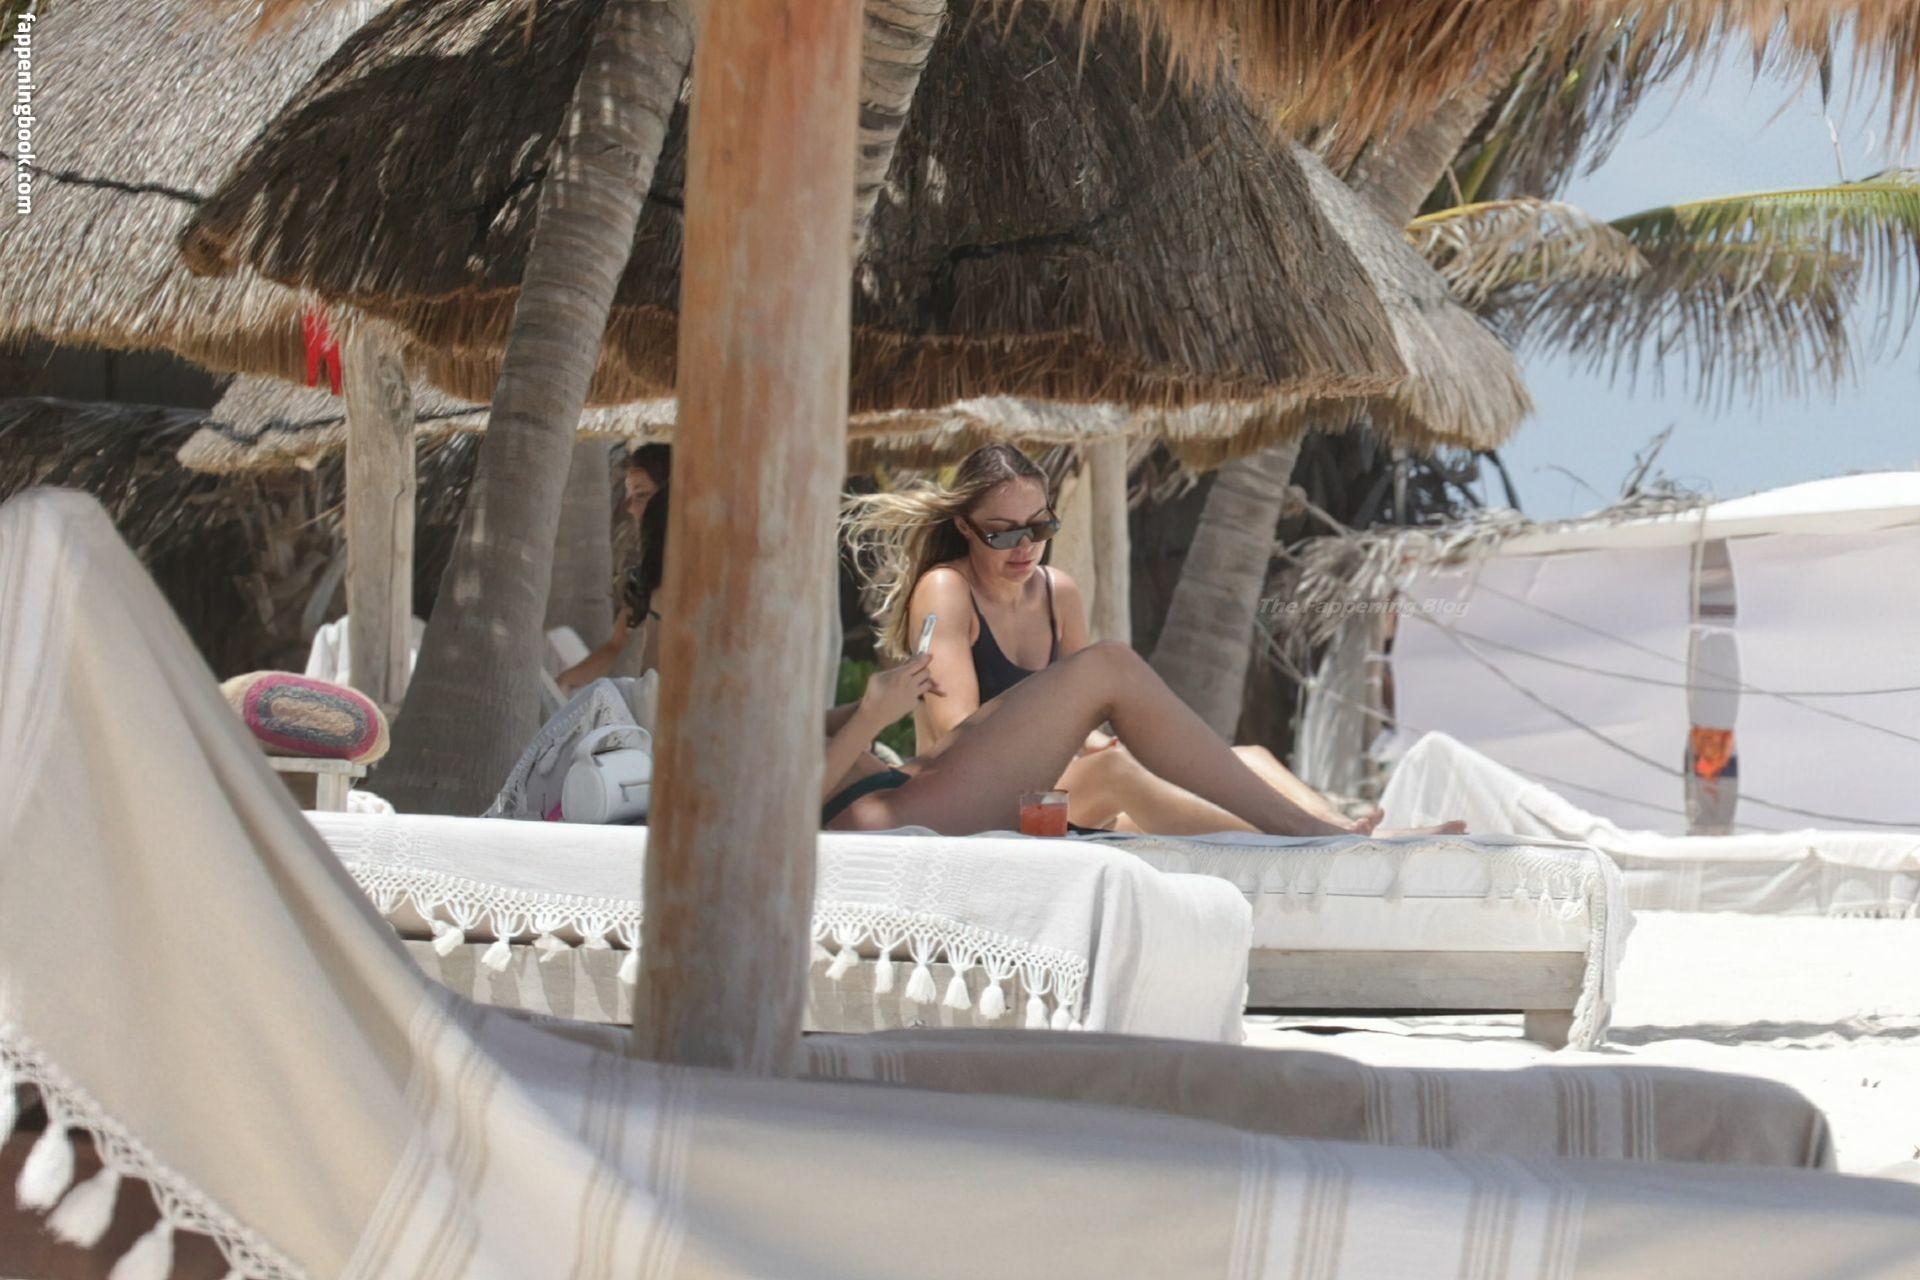 Brandi Cyrus Nude